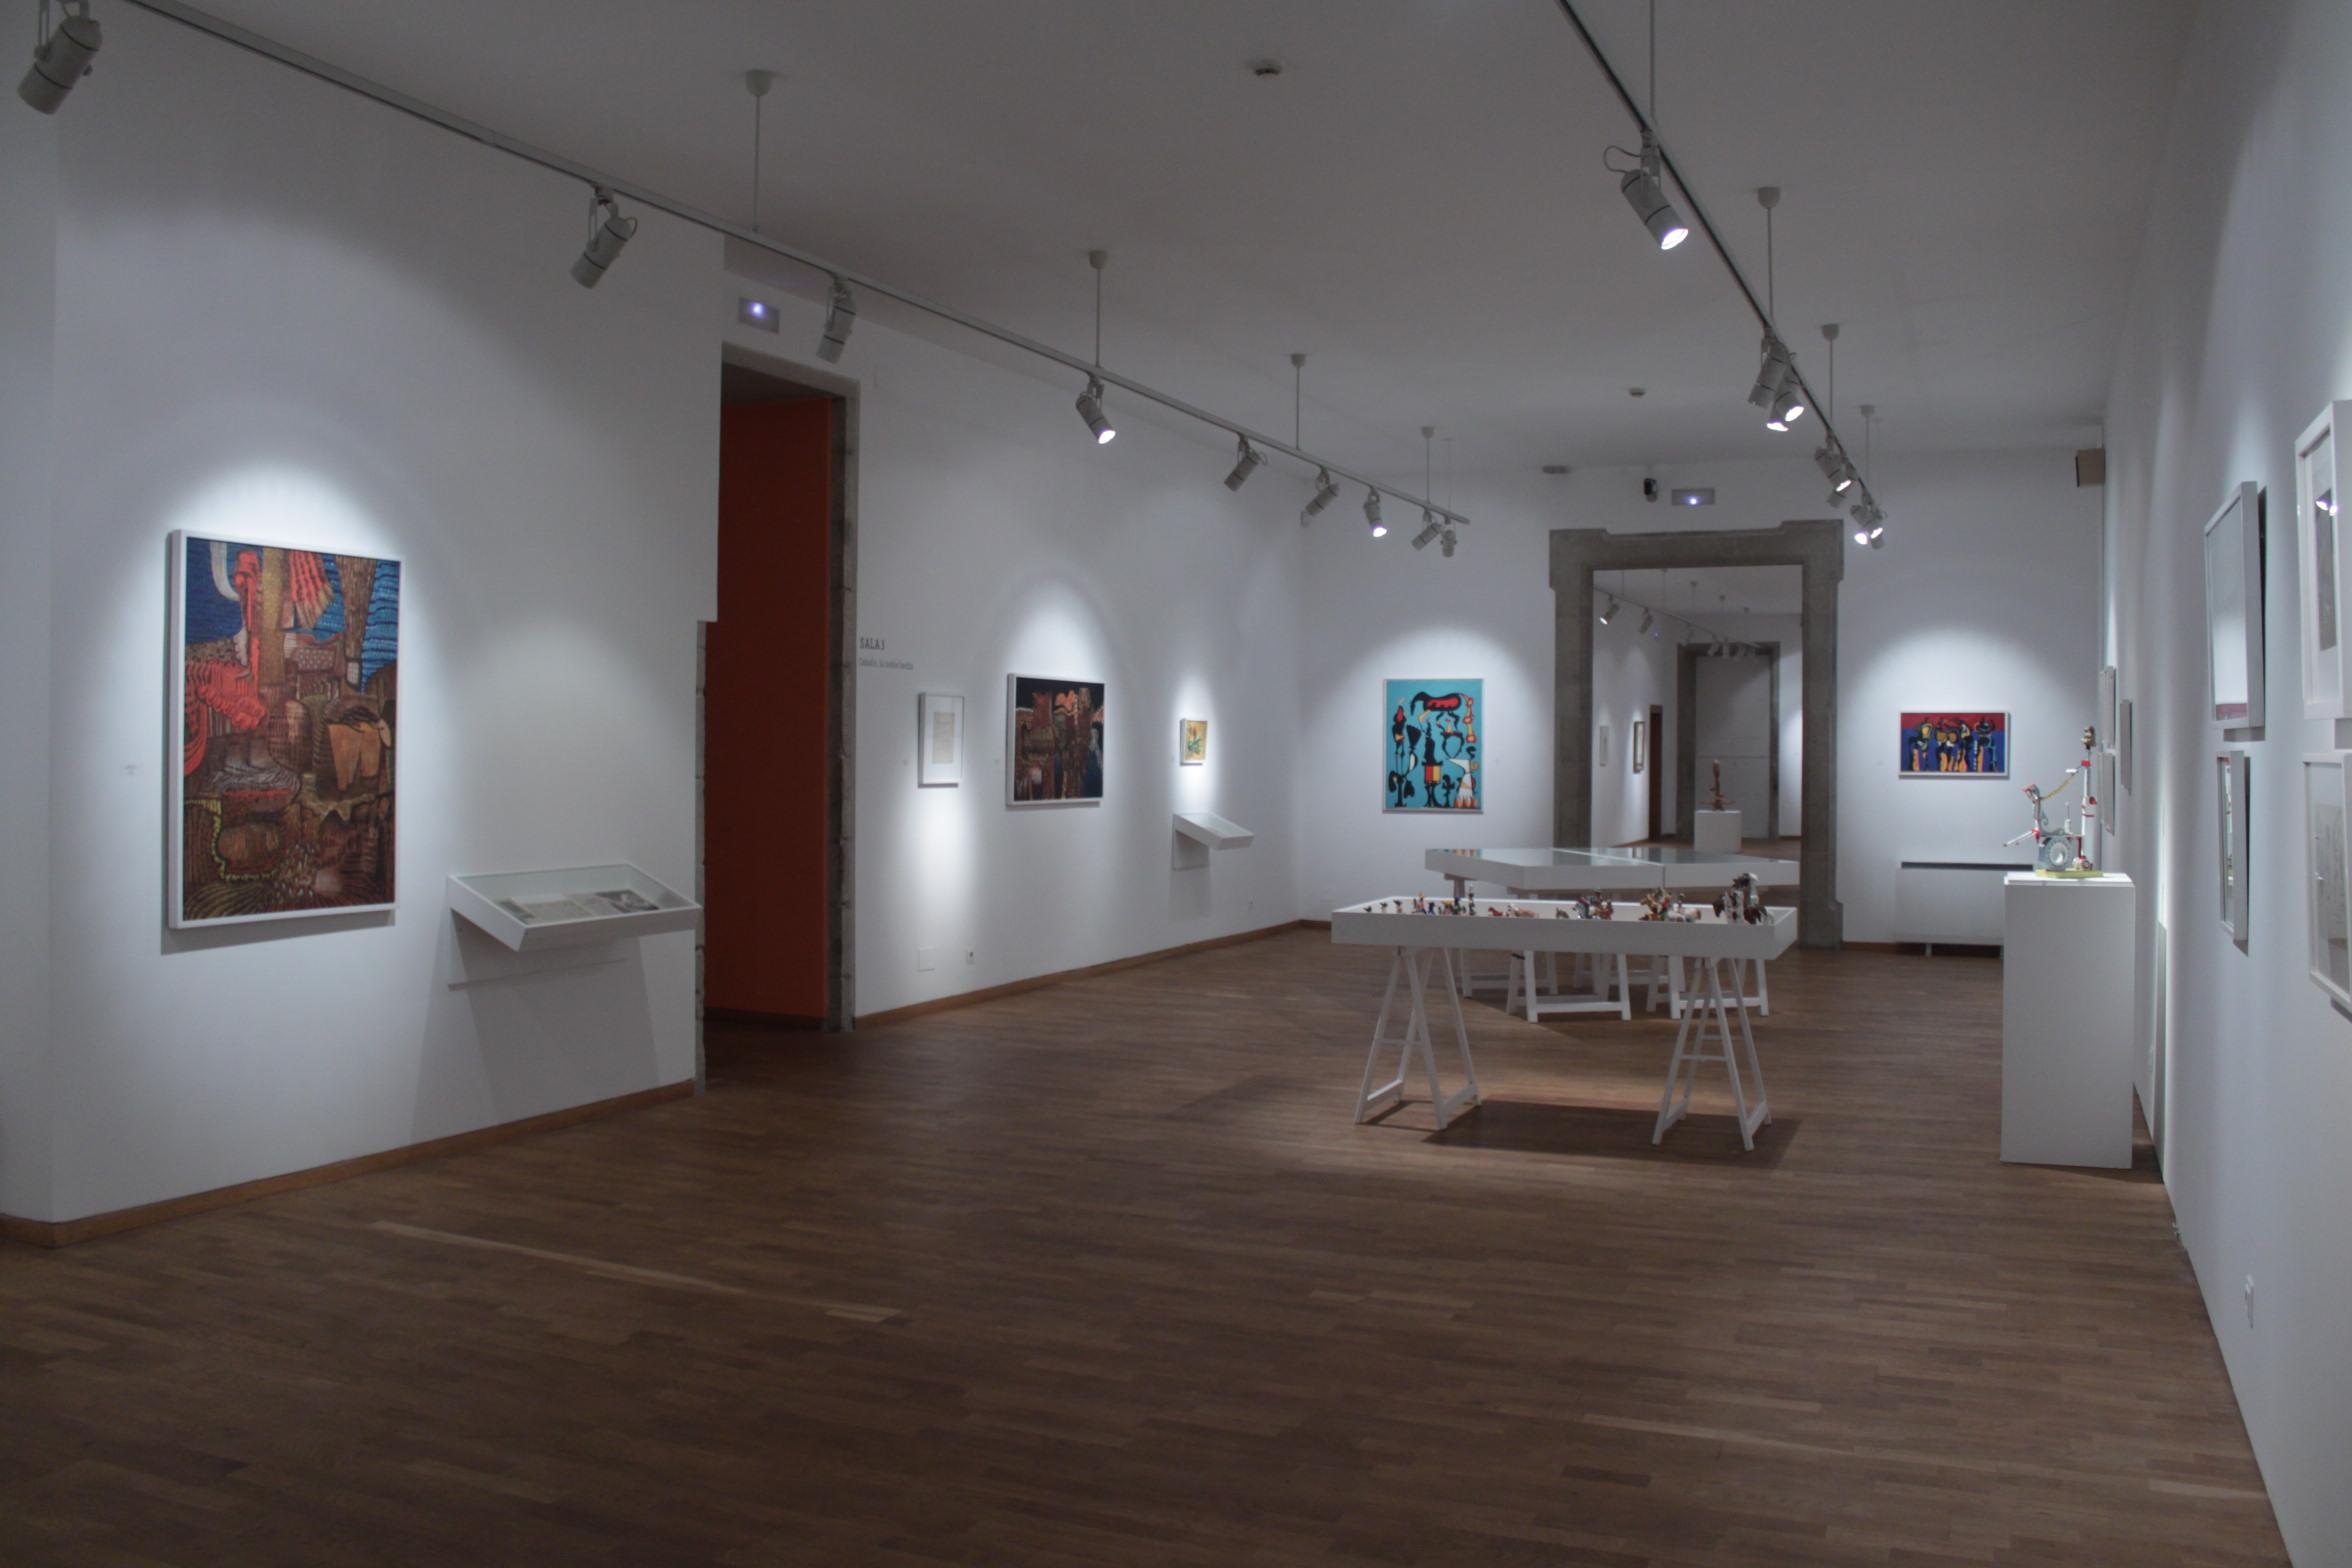 Exhibition hall 3, 3rd floor